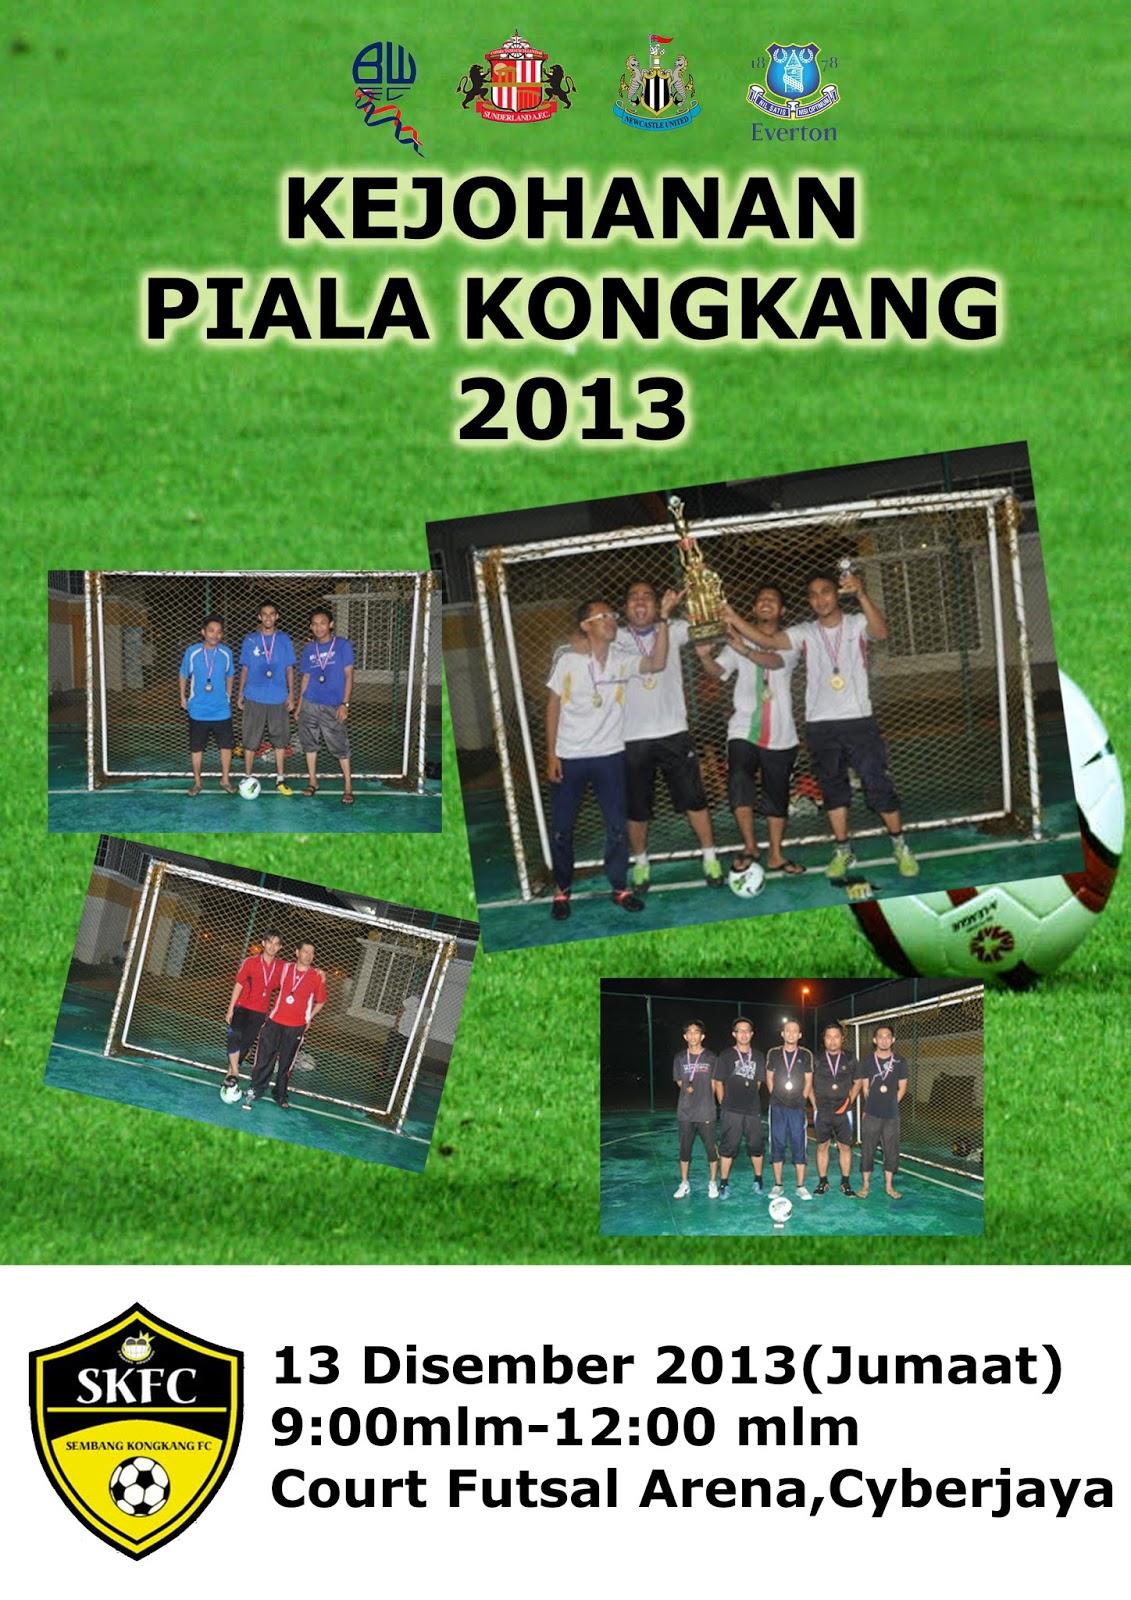 Lama Pertandingan Sepak Bola : pertandingan, sepak, SeMBaNG, KoNgKaNG...:, Sabaq, Merembat